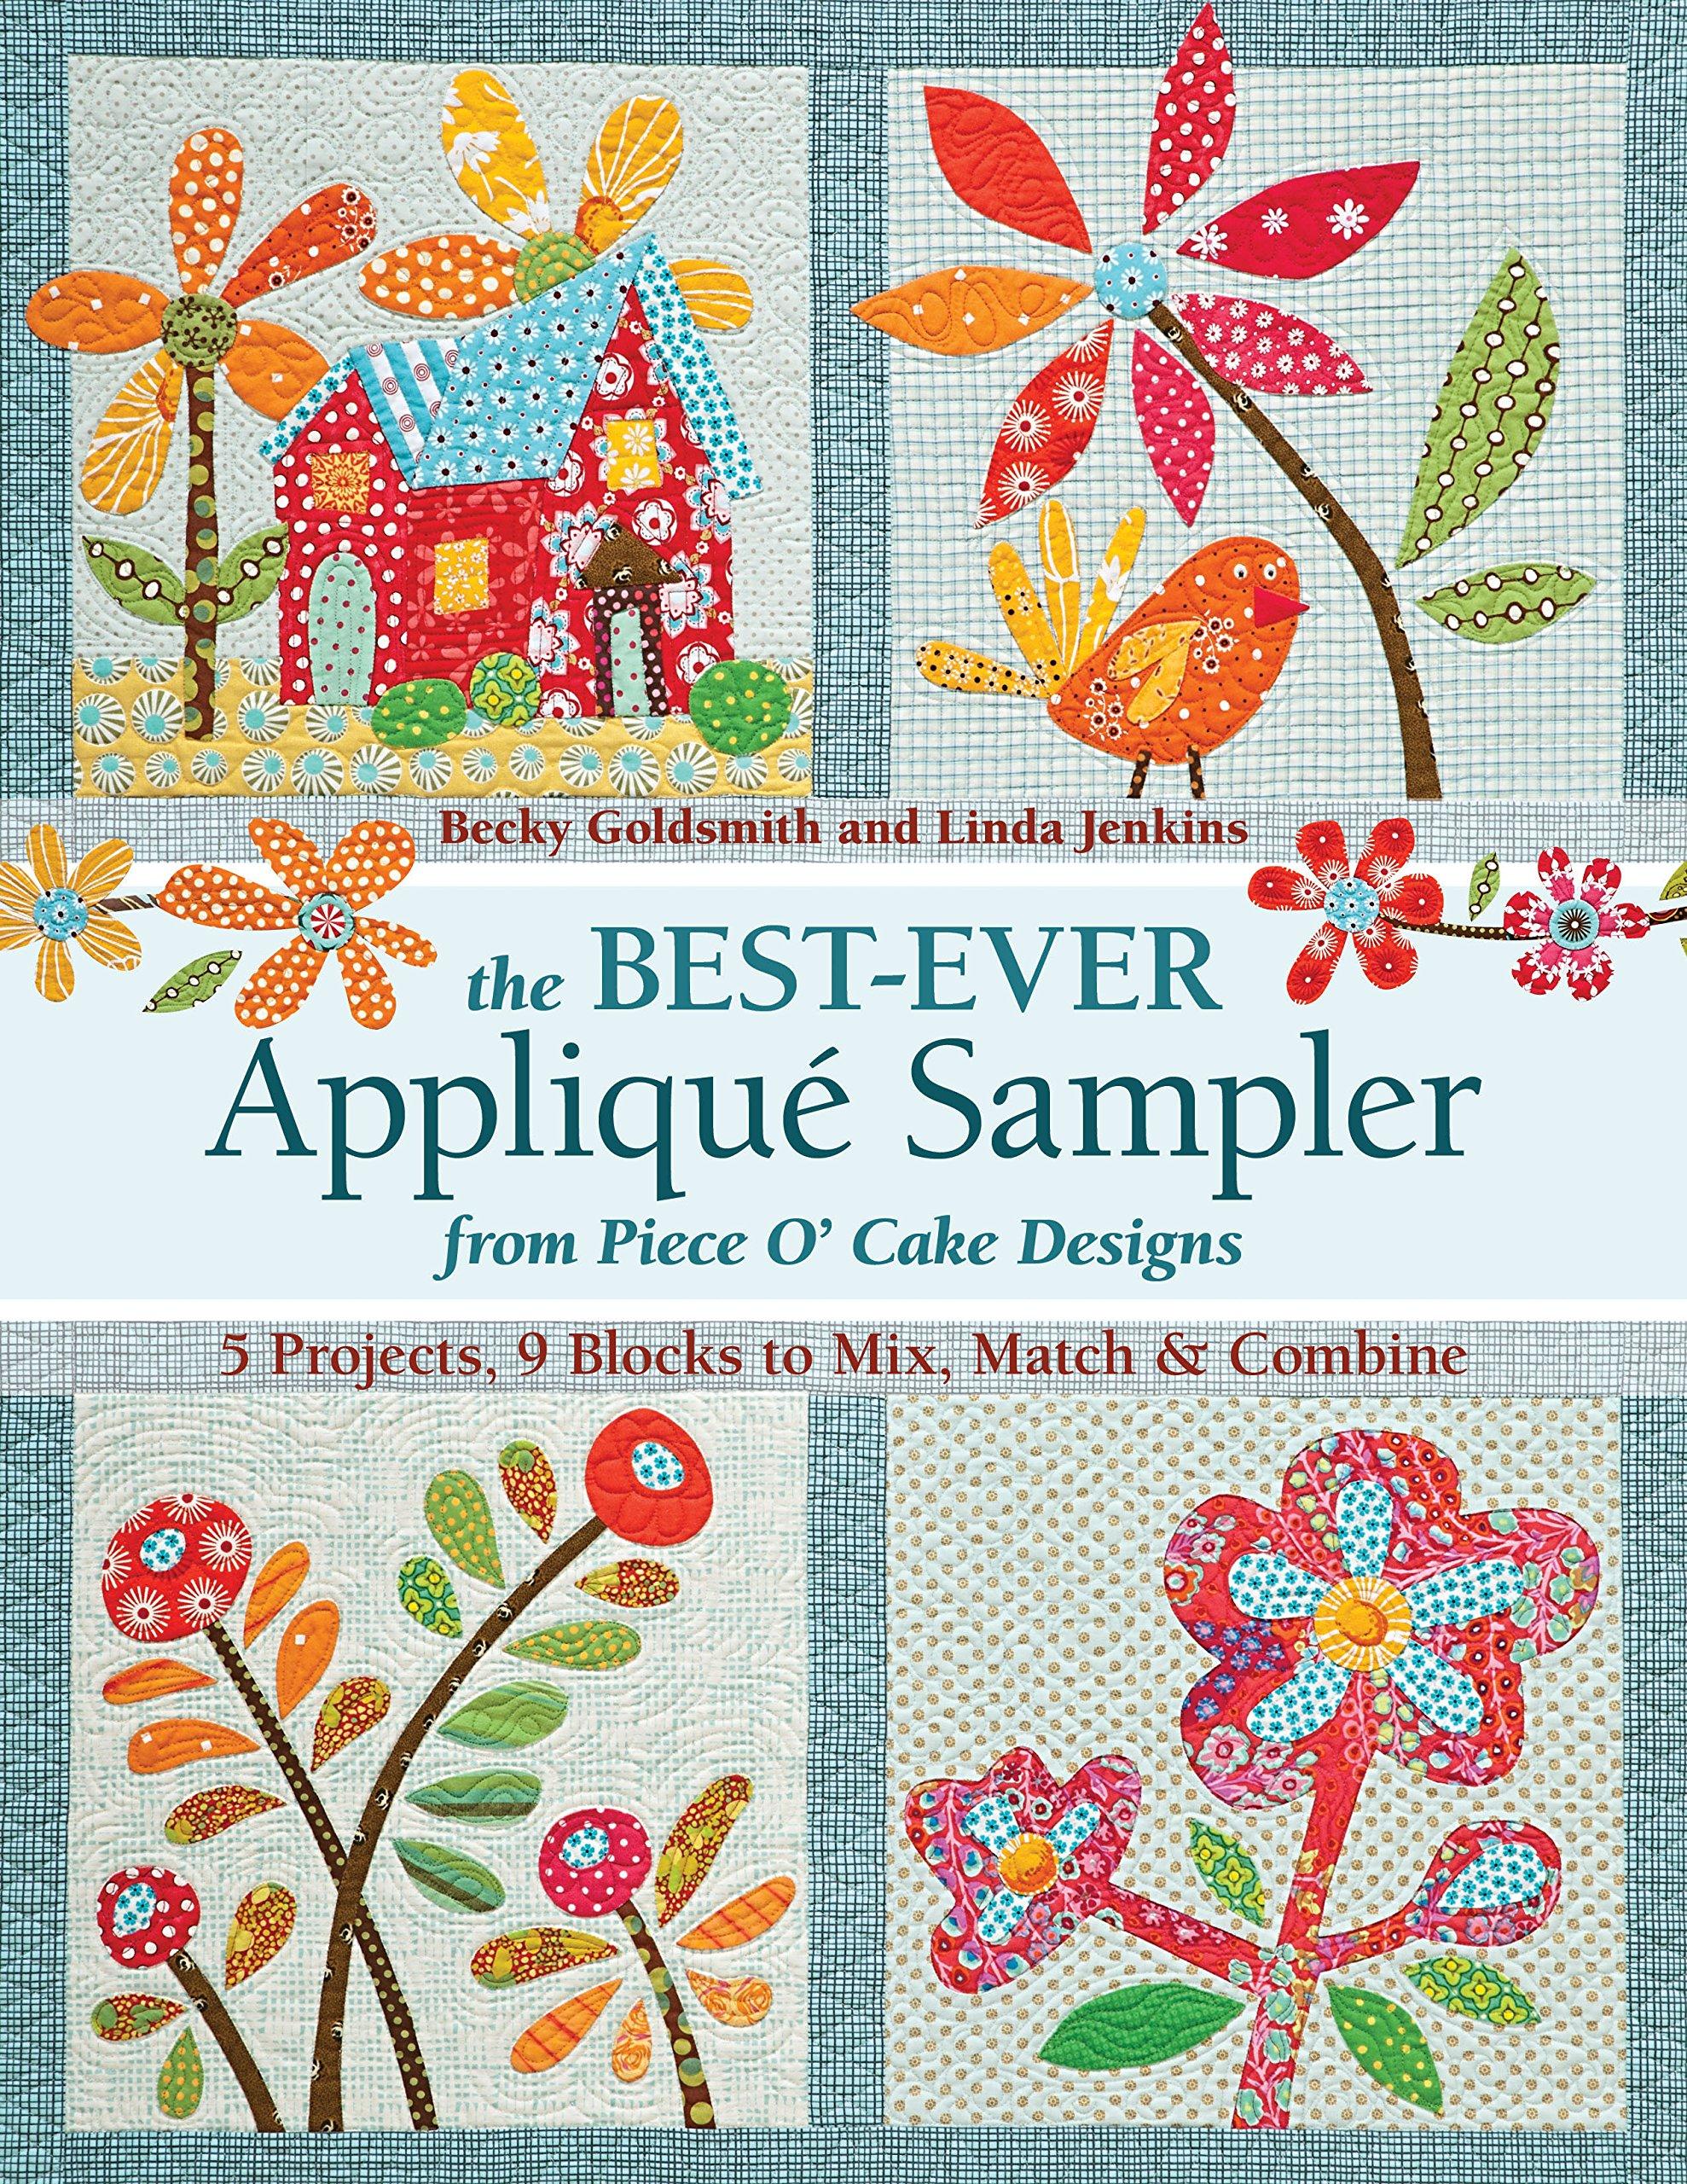 The Best-Ever Applique Sampler from Piece O'Cake Designs